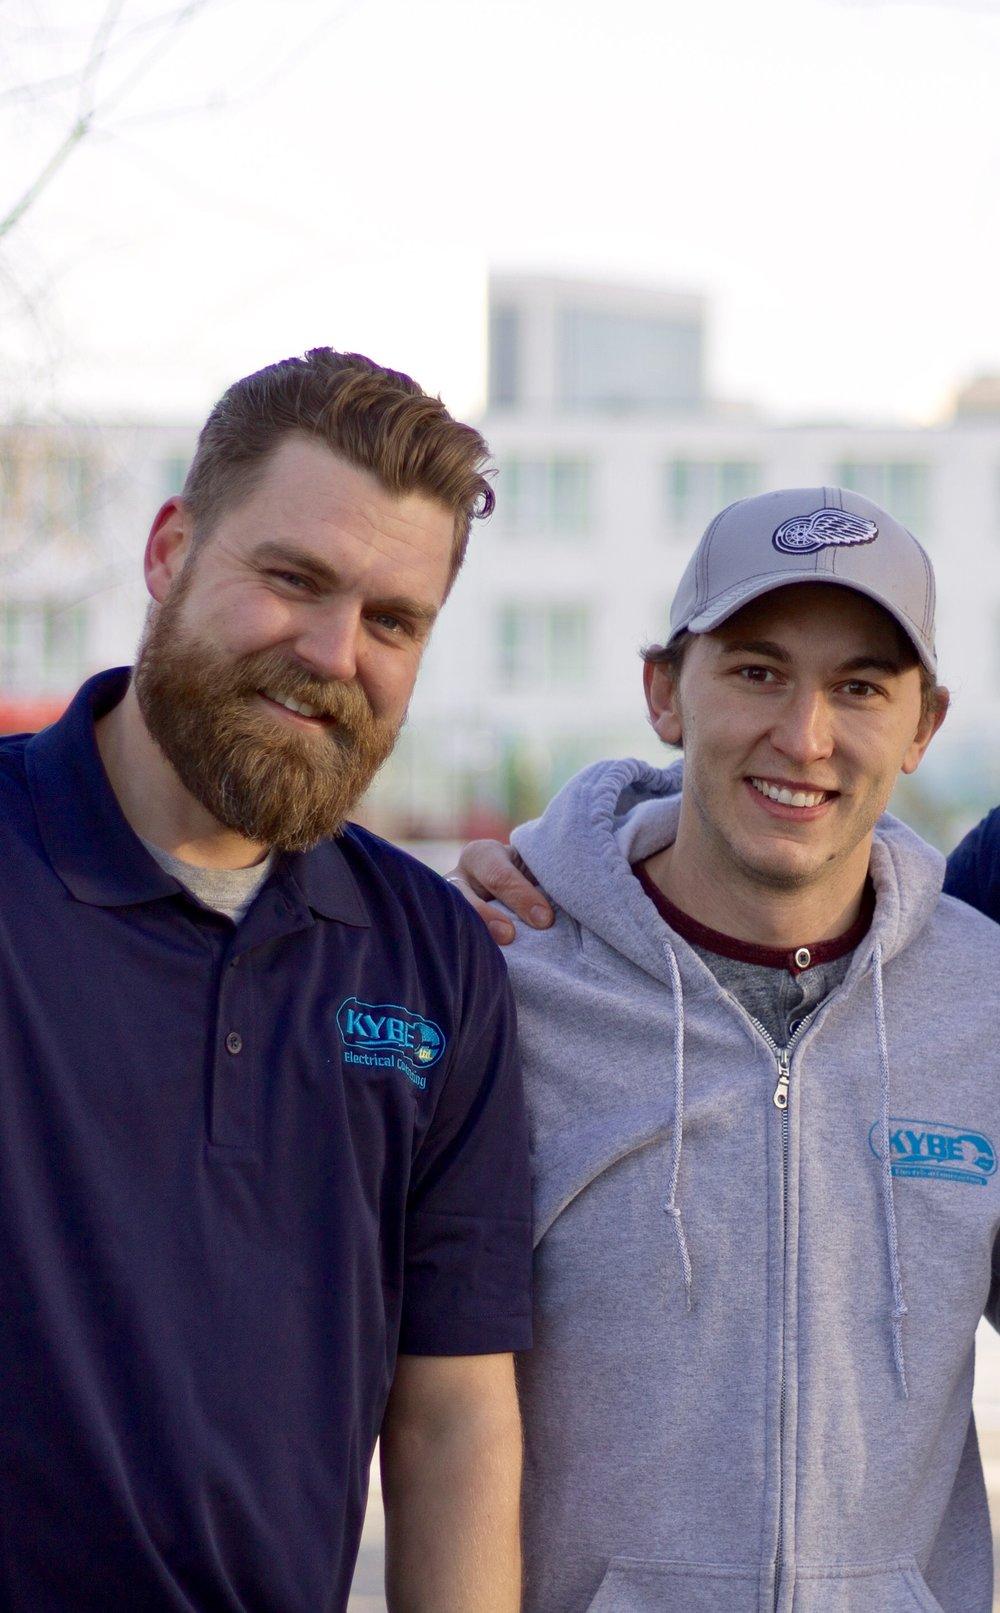 Kyle Robertson & Jason Shaw